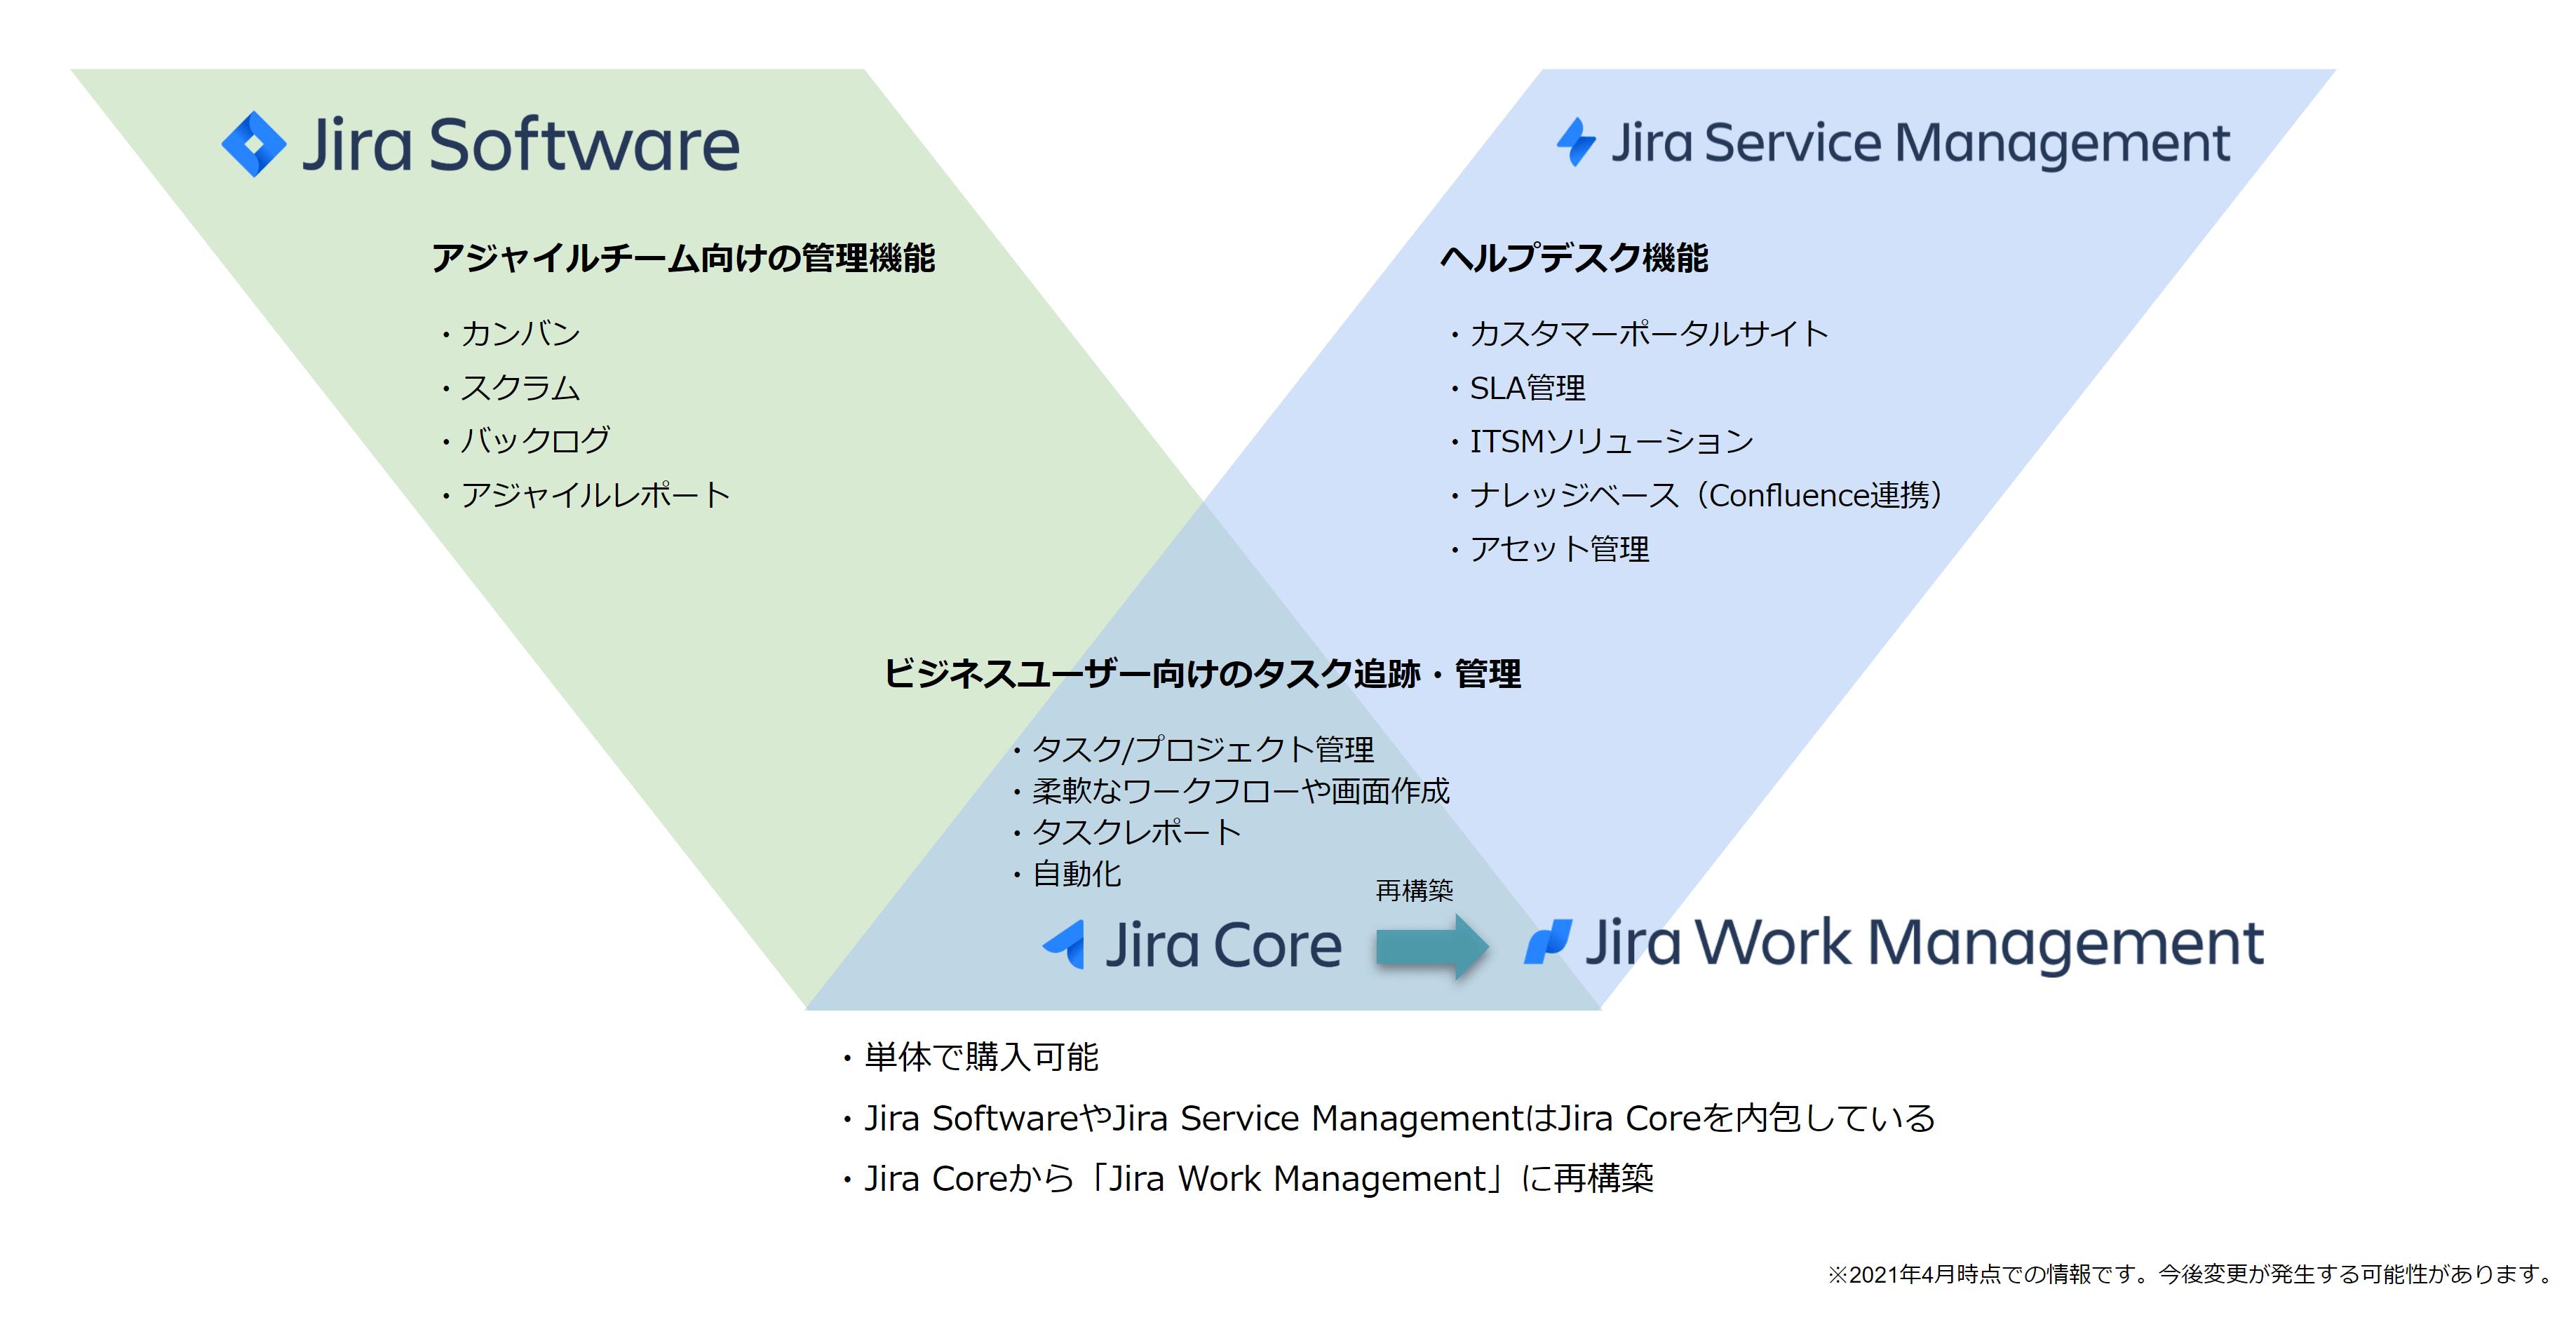 Jira Core の位置づけ